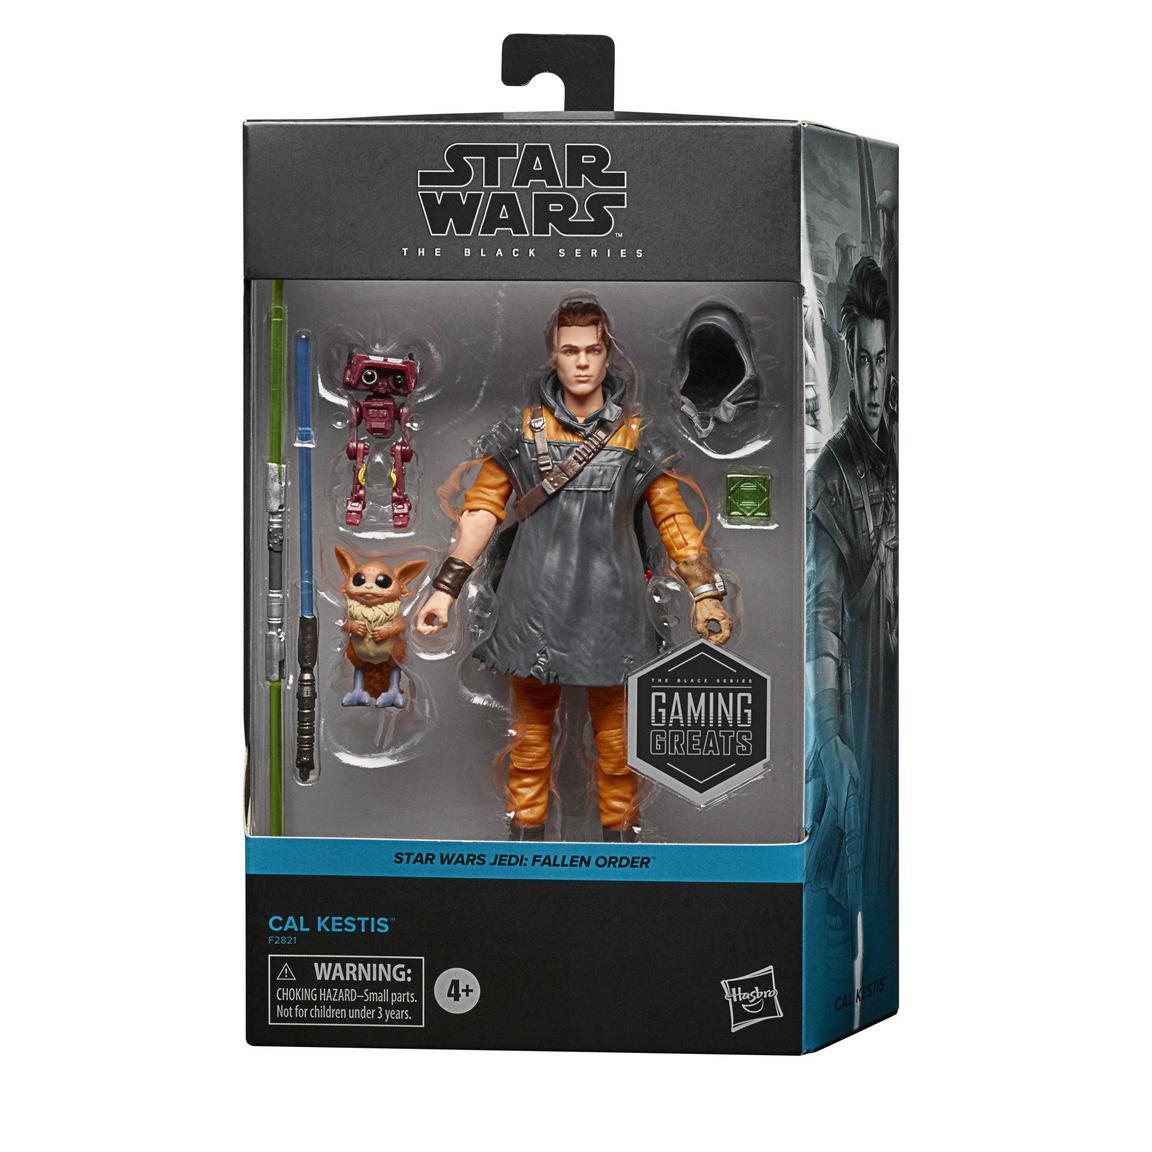 Star Wars The Black Series Jedi: Fallen Order Cal Kestis Deluxe 6-in Action Figure画像